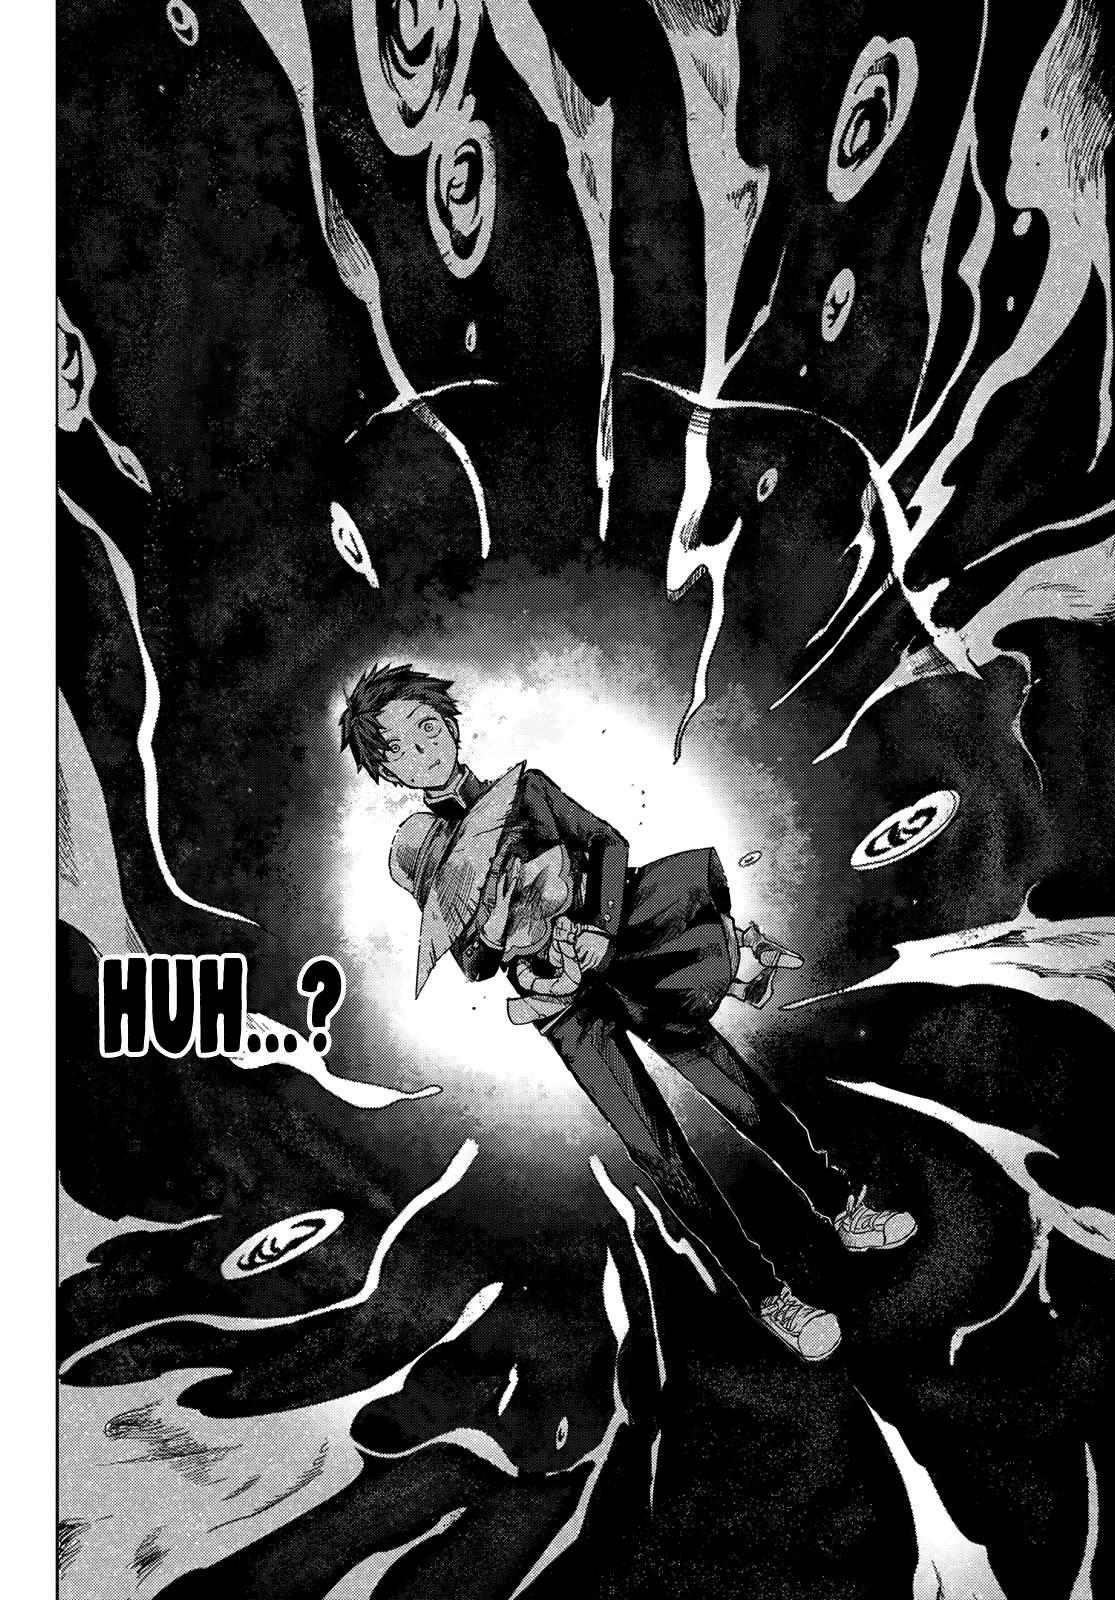 Kyuuki no Adabana - chapter 1-eng-li